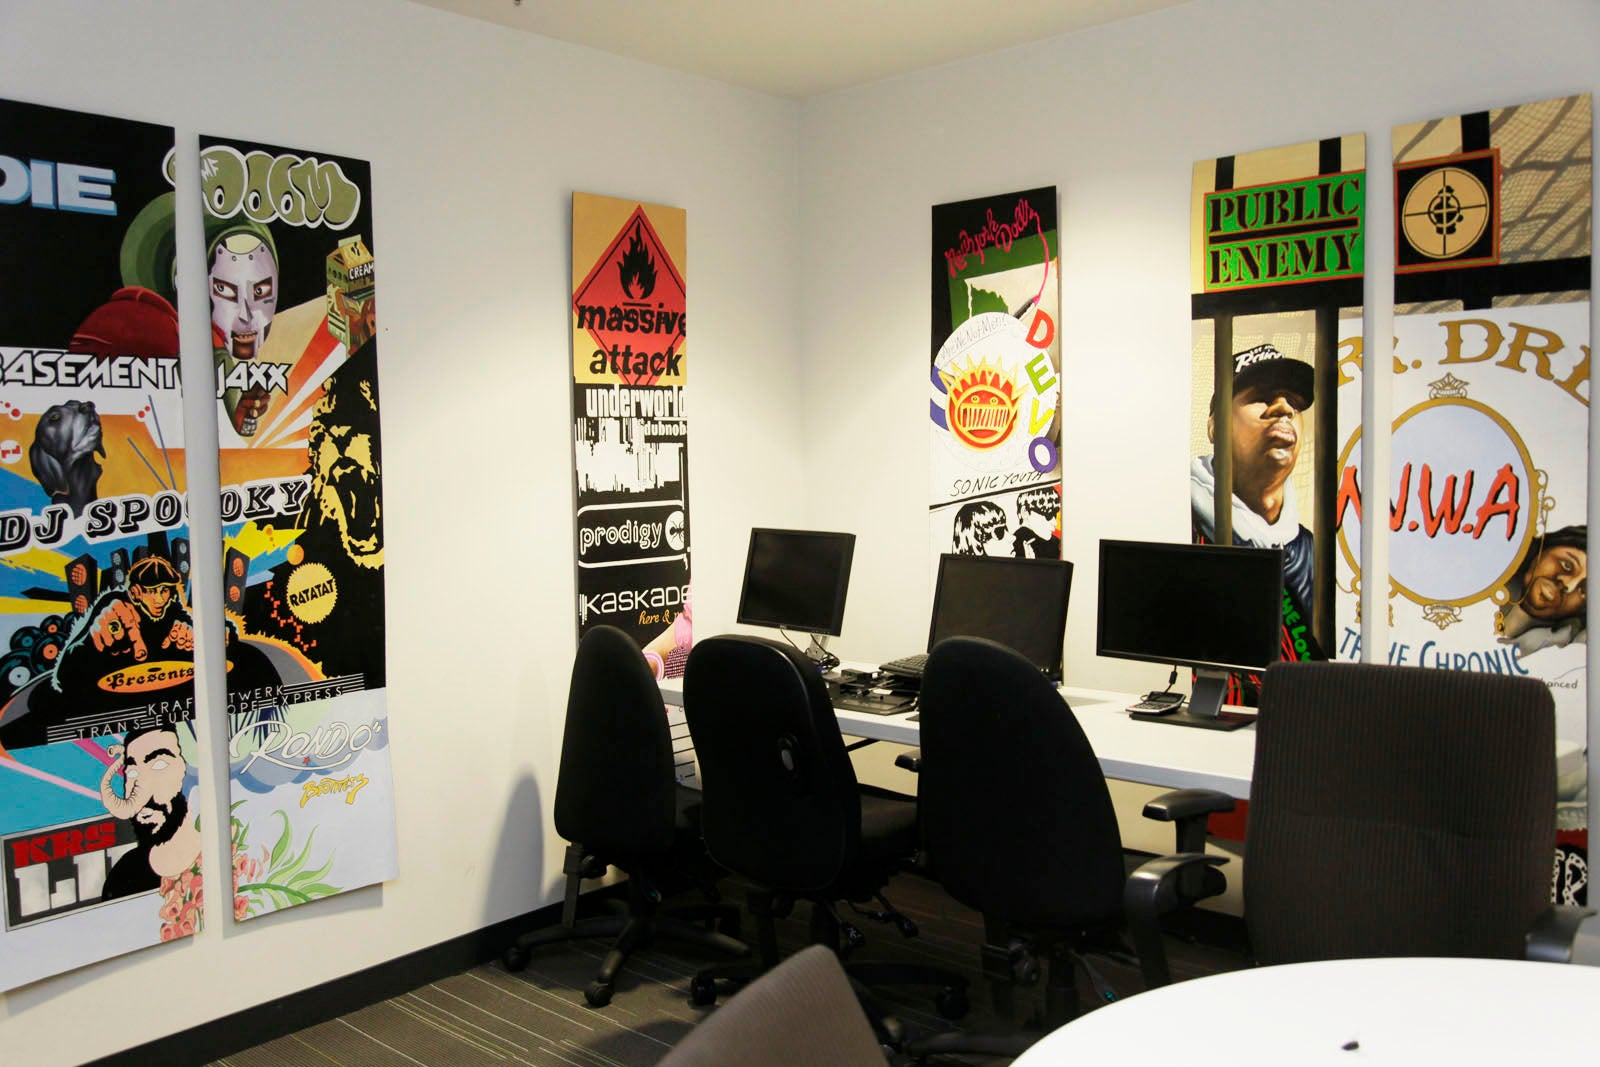 Pandora Radio - Cool Office Spaces 2013